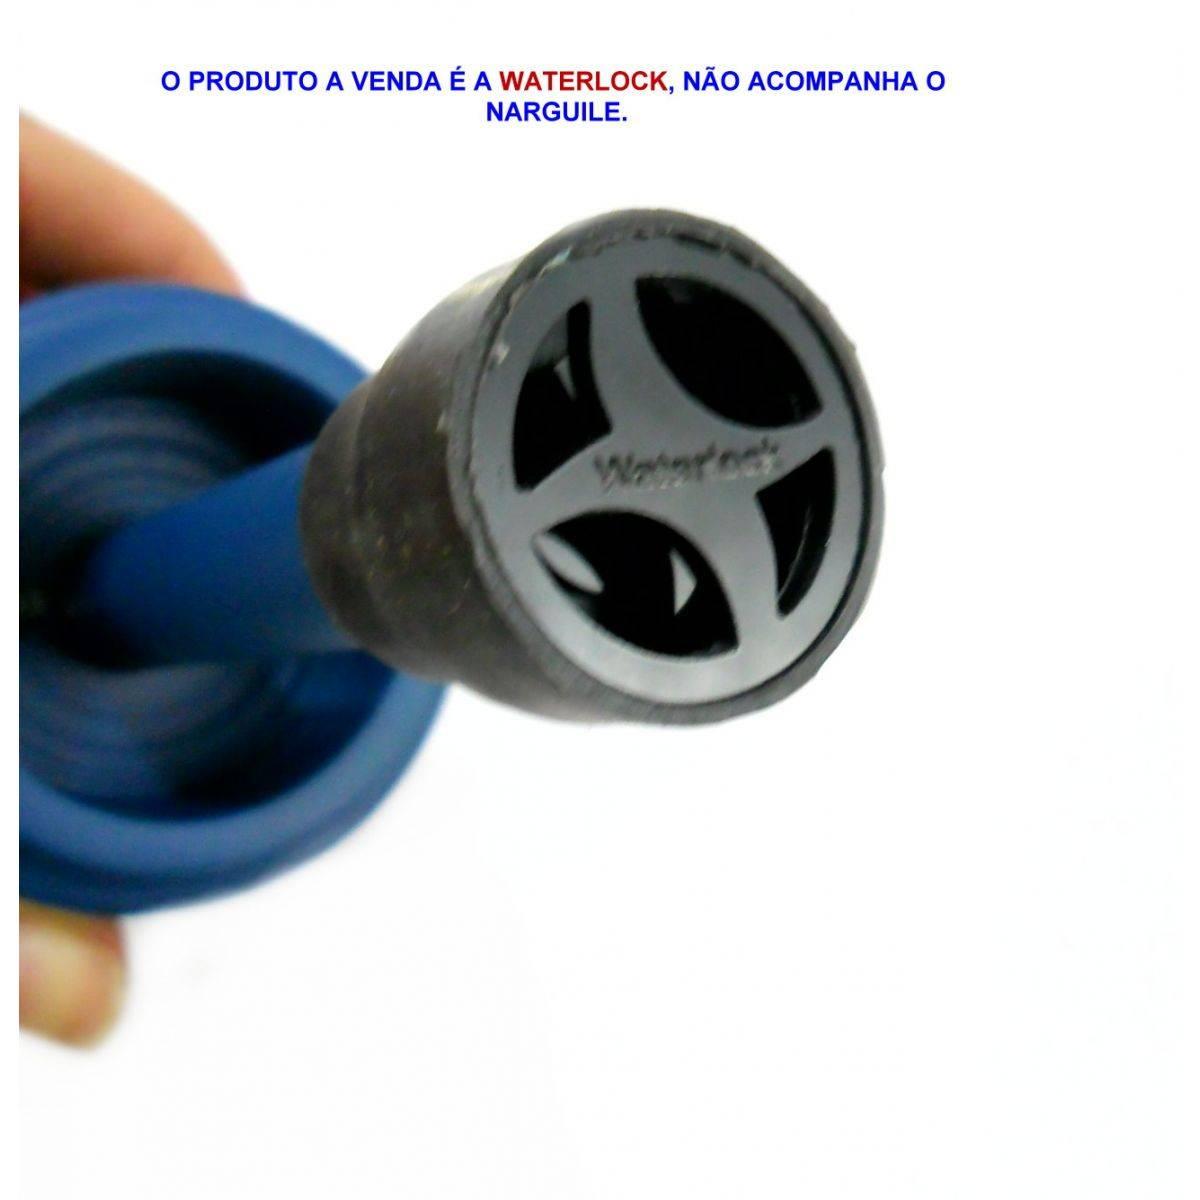 Water lock, evita que suba água pelo tubo. - WATERLOCK Azul